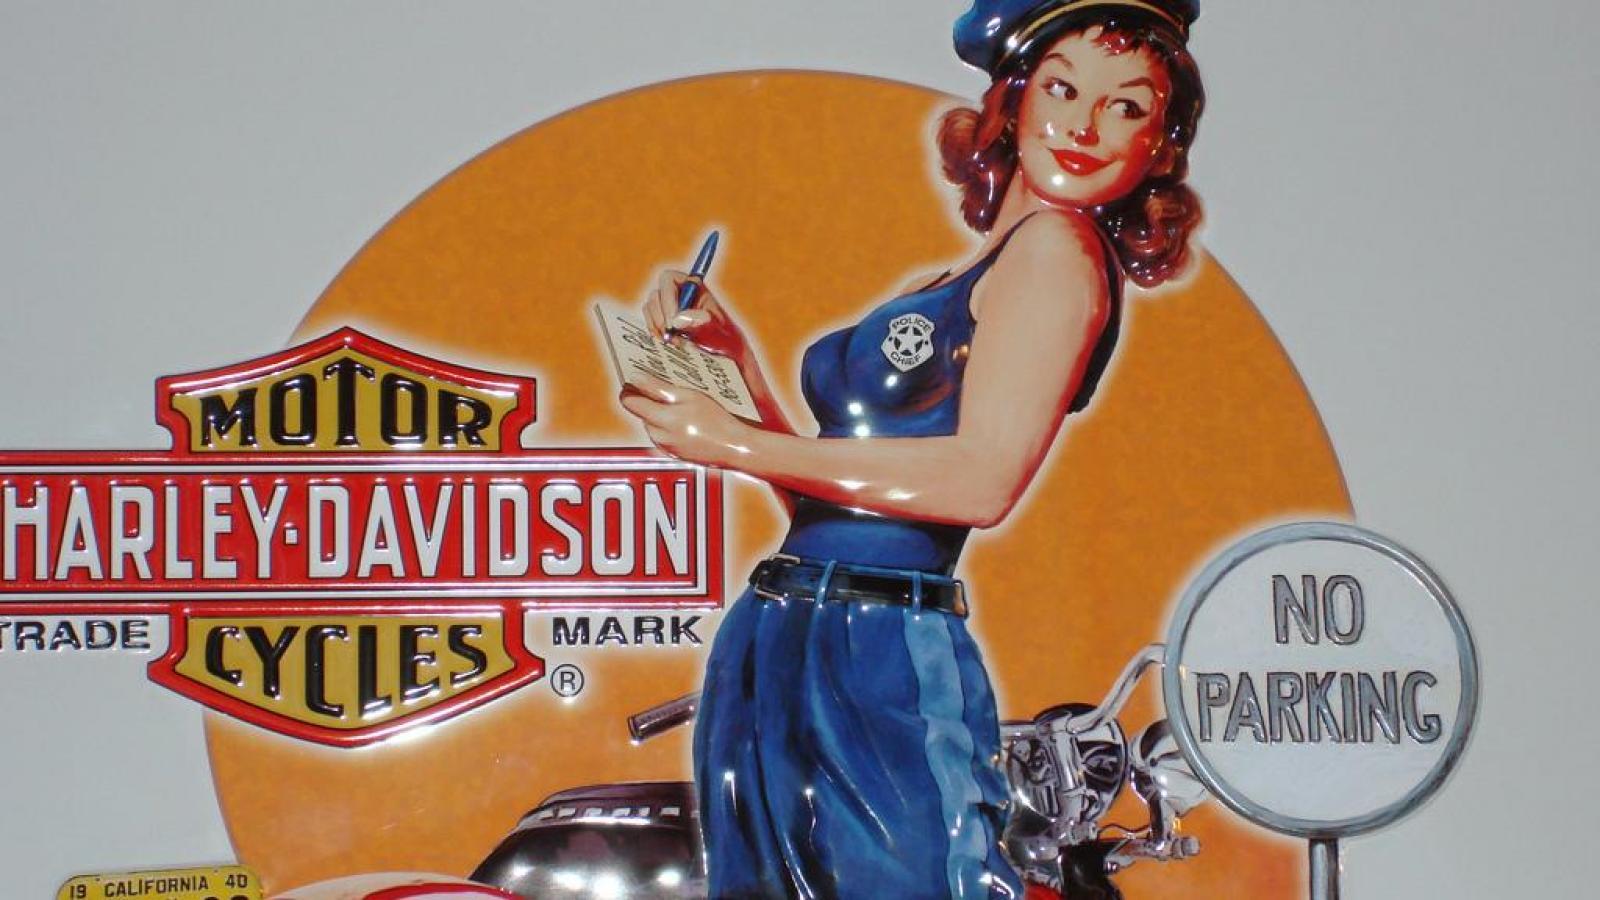 Harley Davidson Pin Up Wallpaper - WallpaperSafari